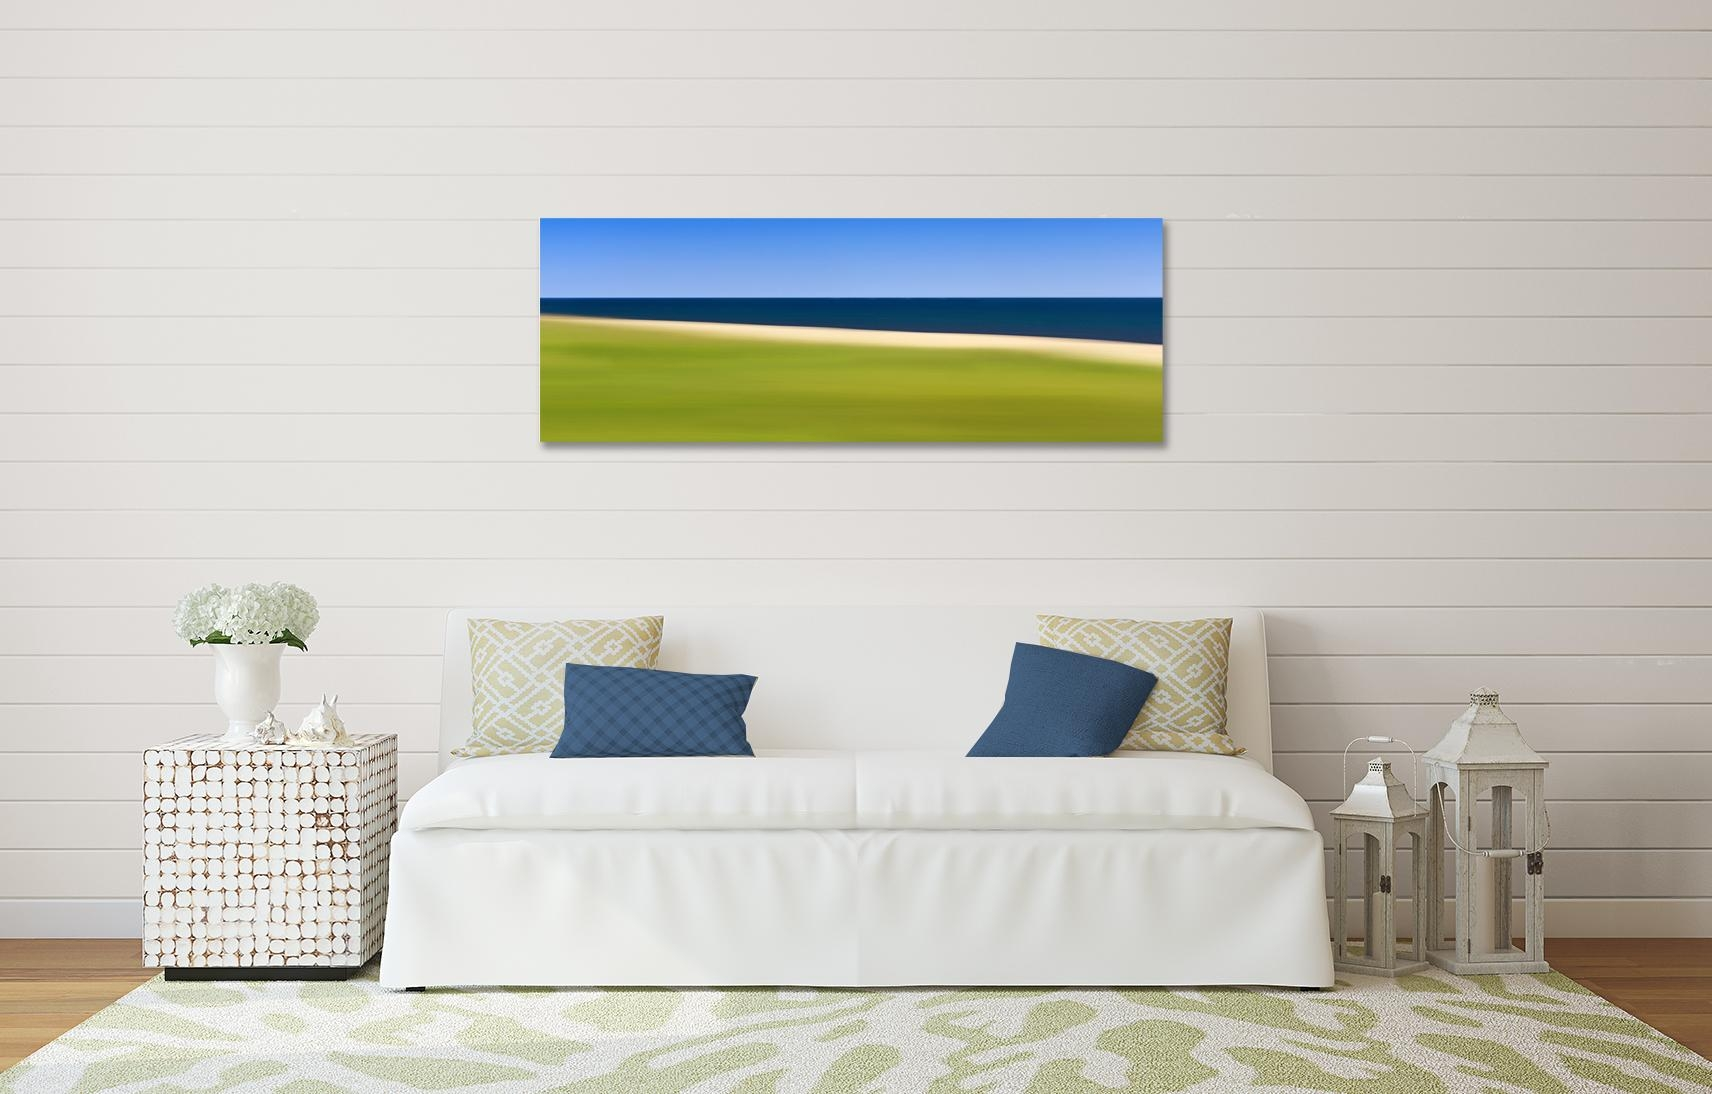 Fine Art Prints For Sale | Abstract Art, Large Canvas Wall Art Regarding Coastal Wall Art (Photo 12 of 20)